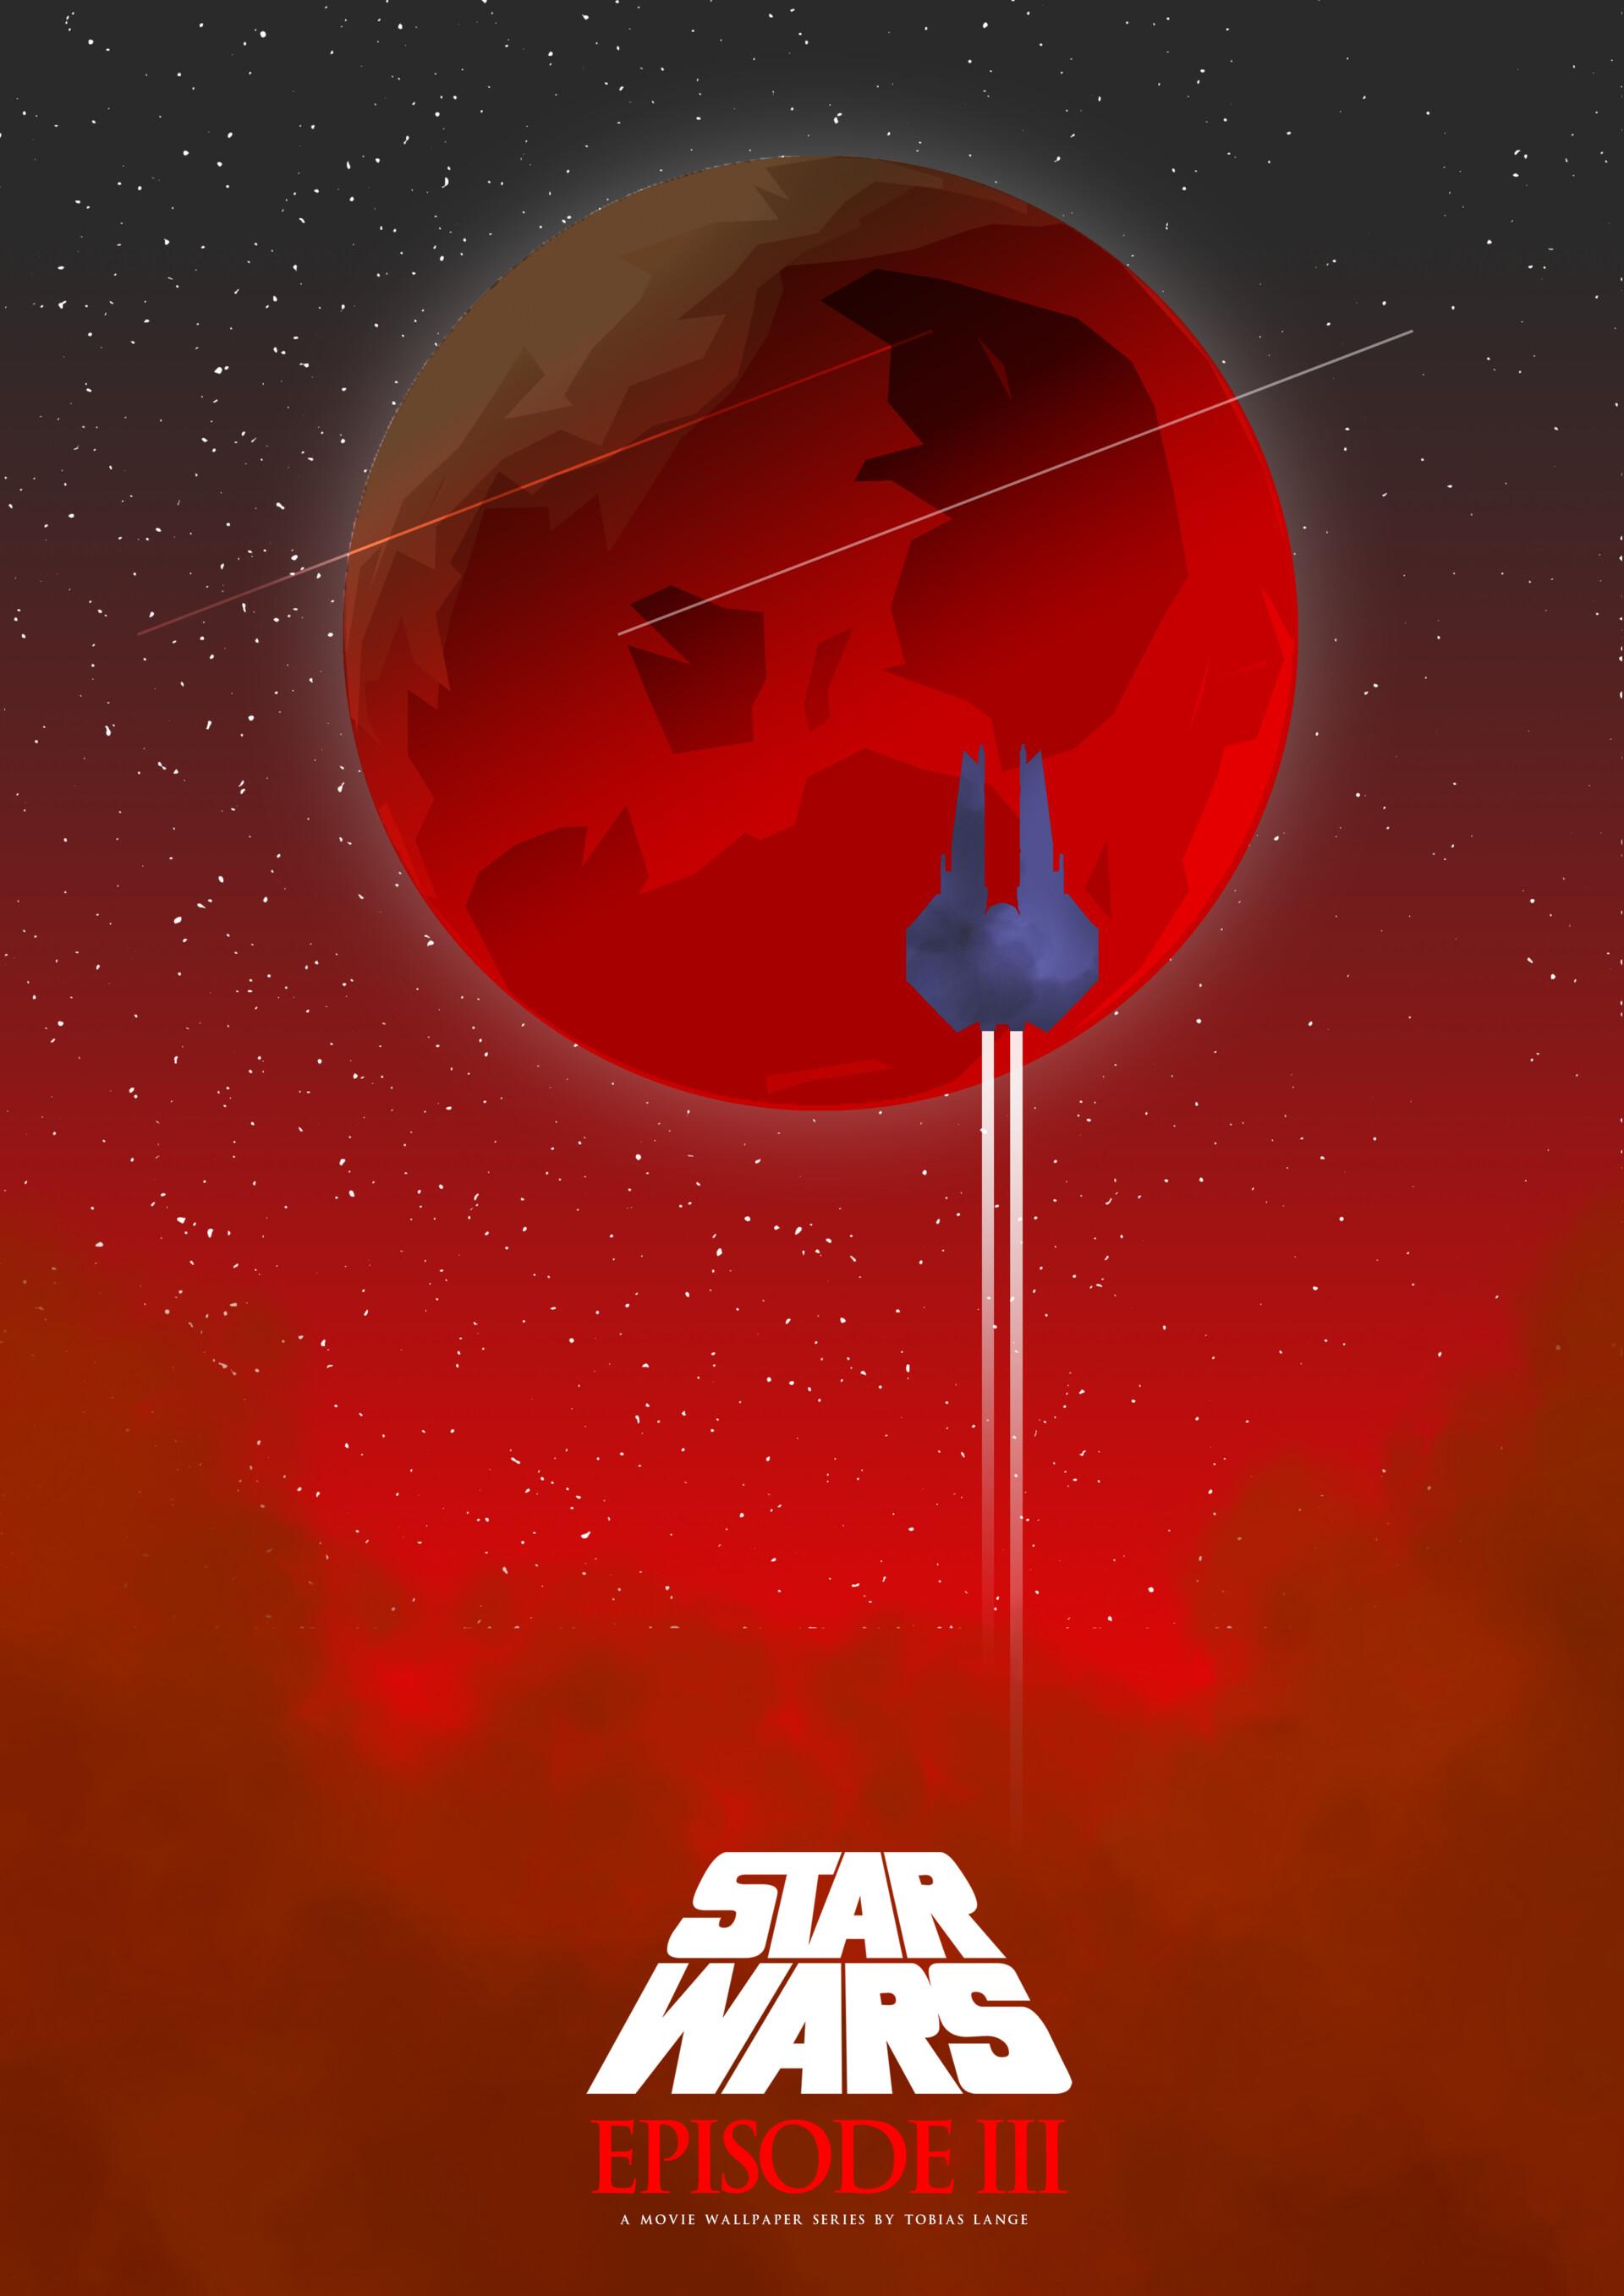 a star wars movie poster series